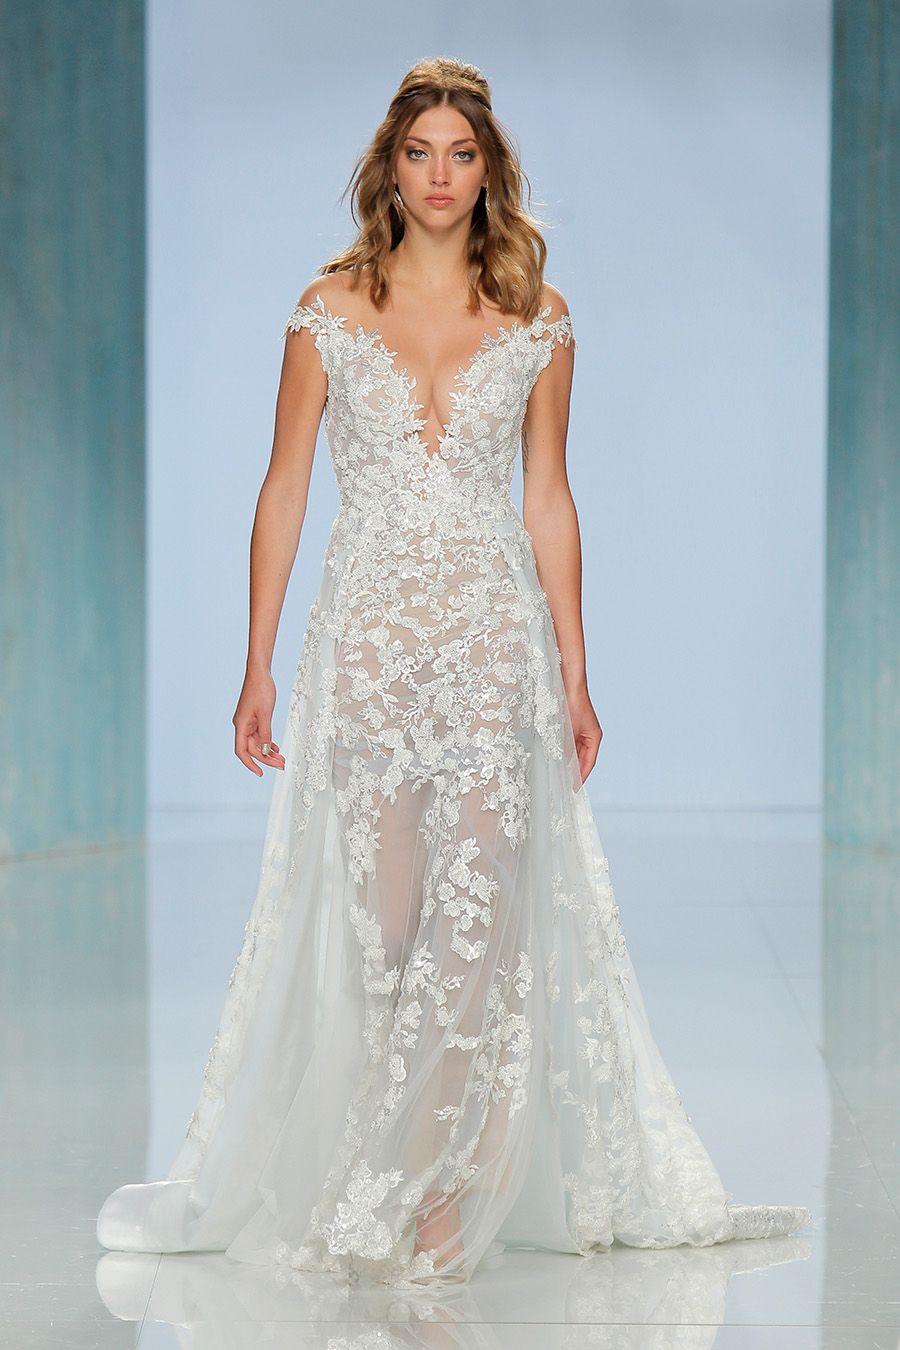 Sheer wedding dress  Barcelona Bridal Fashion Week  Galia Lahav  Wedding Gowns and